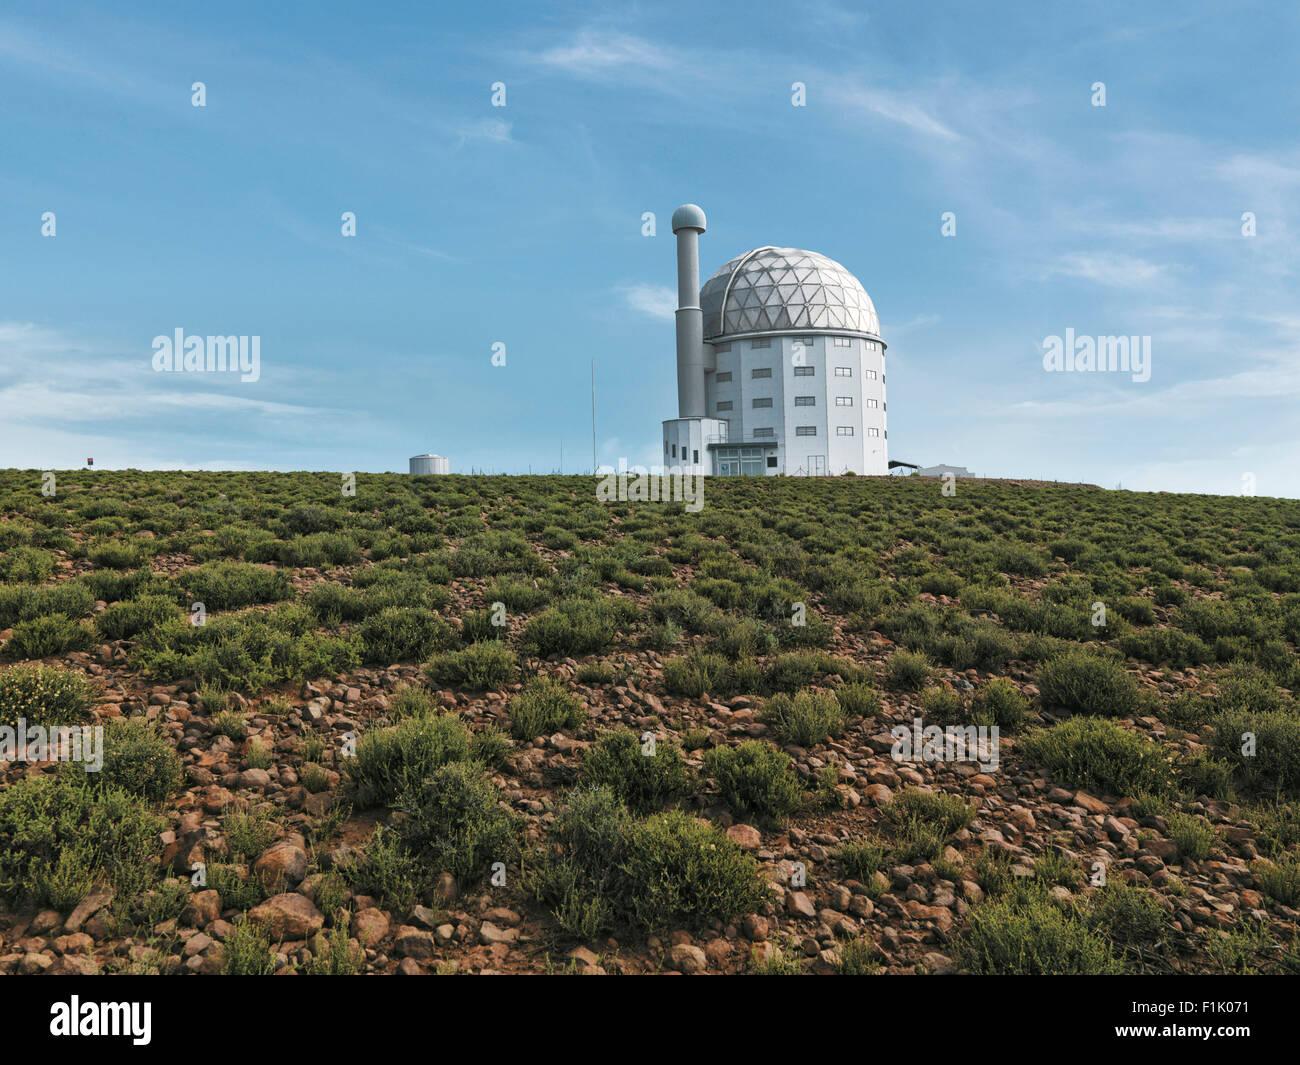 South African Large Telescope (SALT) - Stock Image